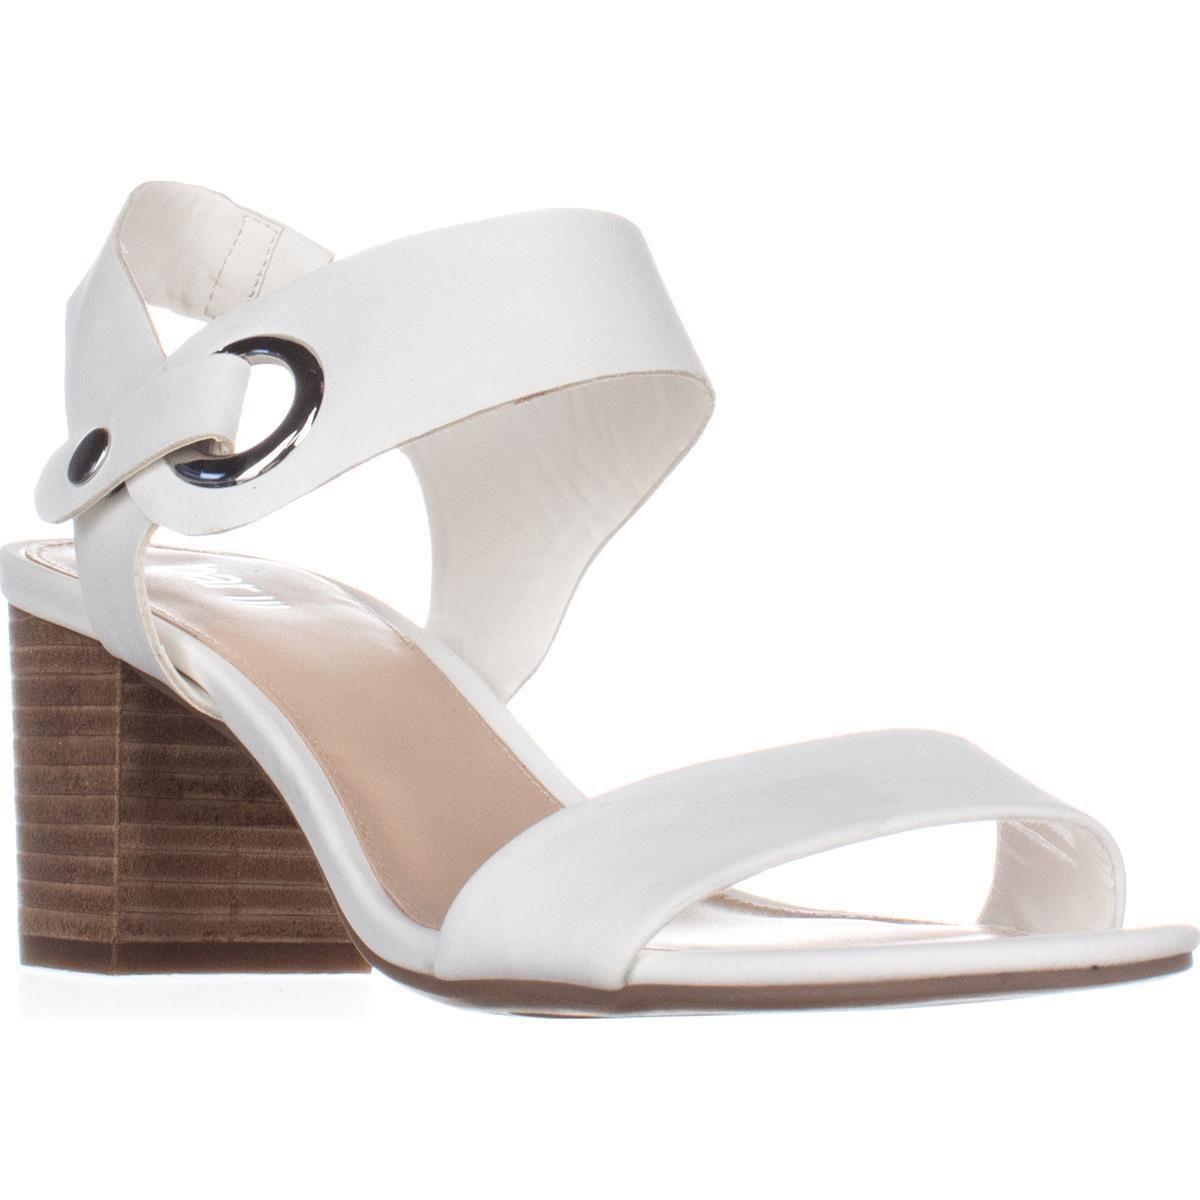 8f3657292e3 B35 Birdie Block Heel Dress Sandals